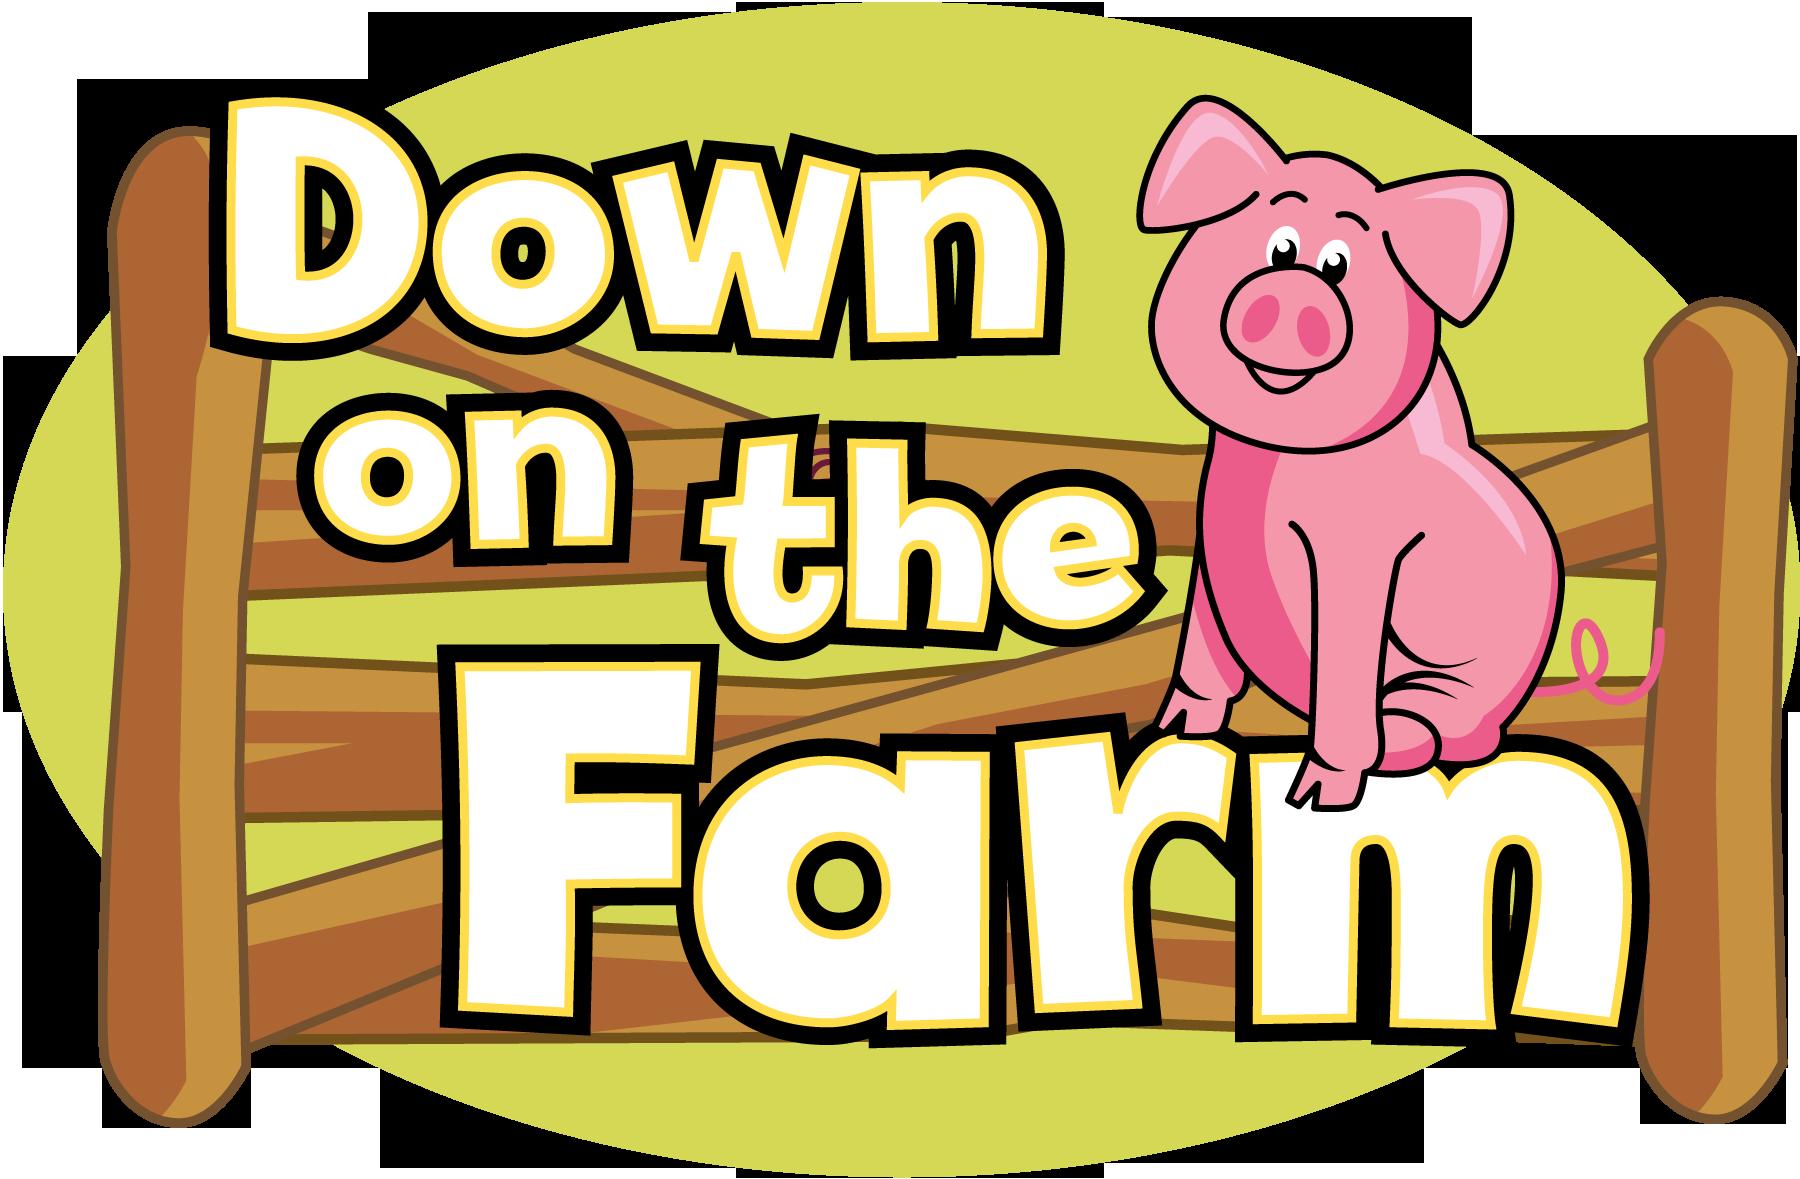 Farmhouse clipart field trip. Livestock clip art farm